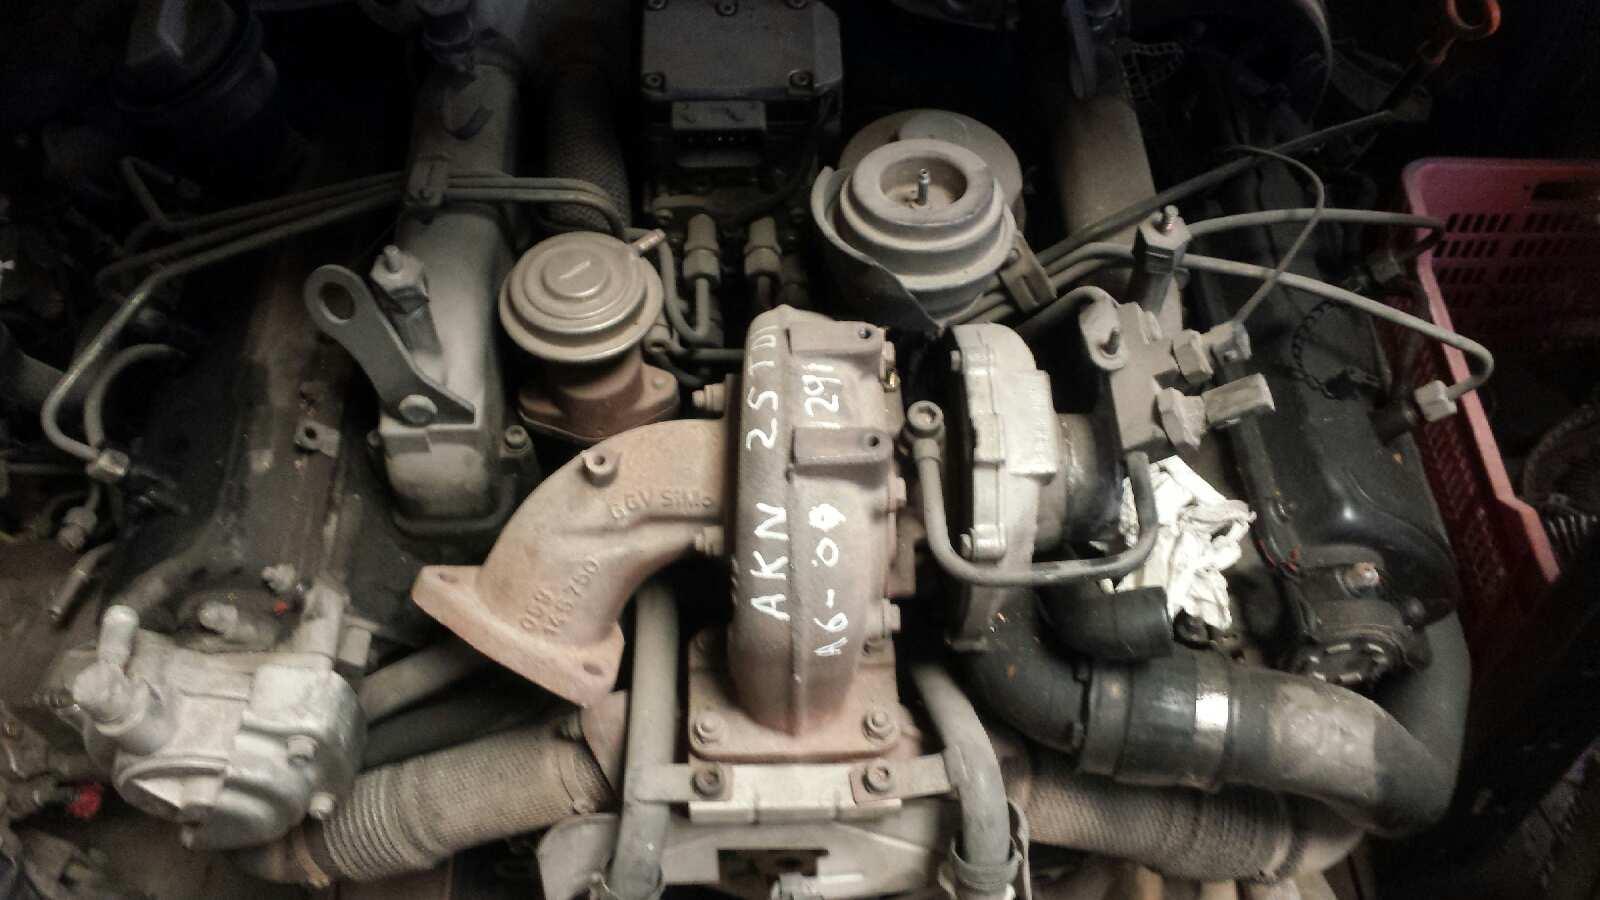 Motor completo de Audi A6 berlina (4b2) (1997 - 2001) AKN